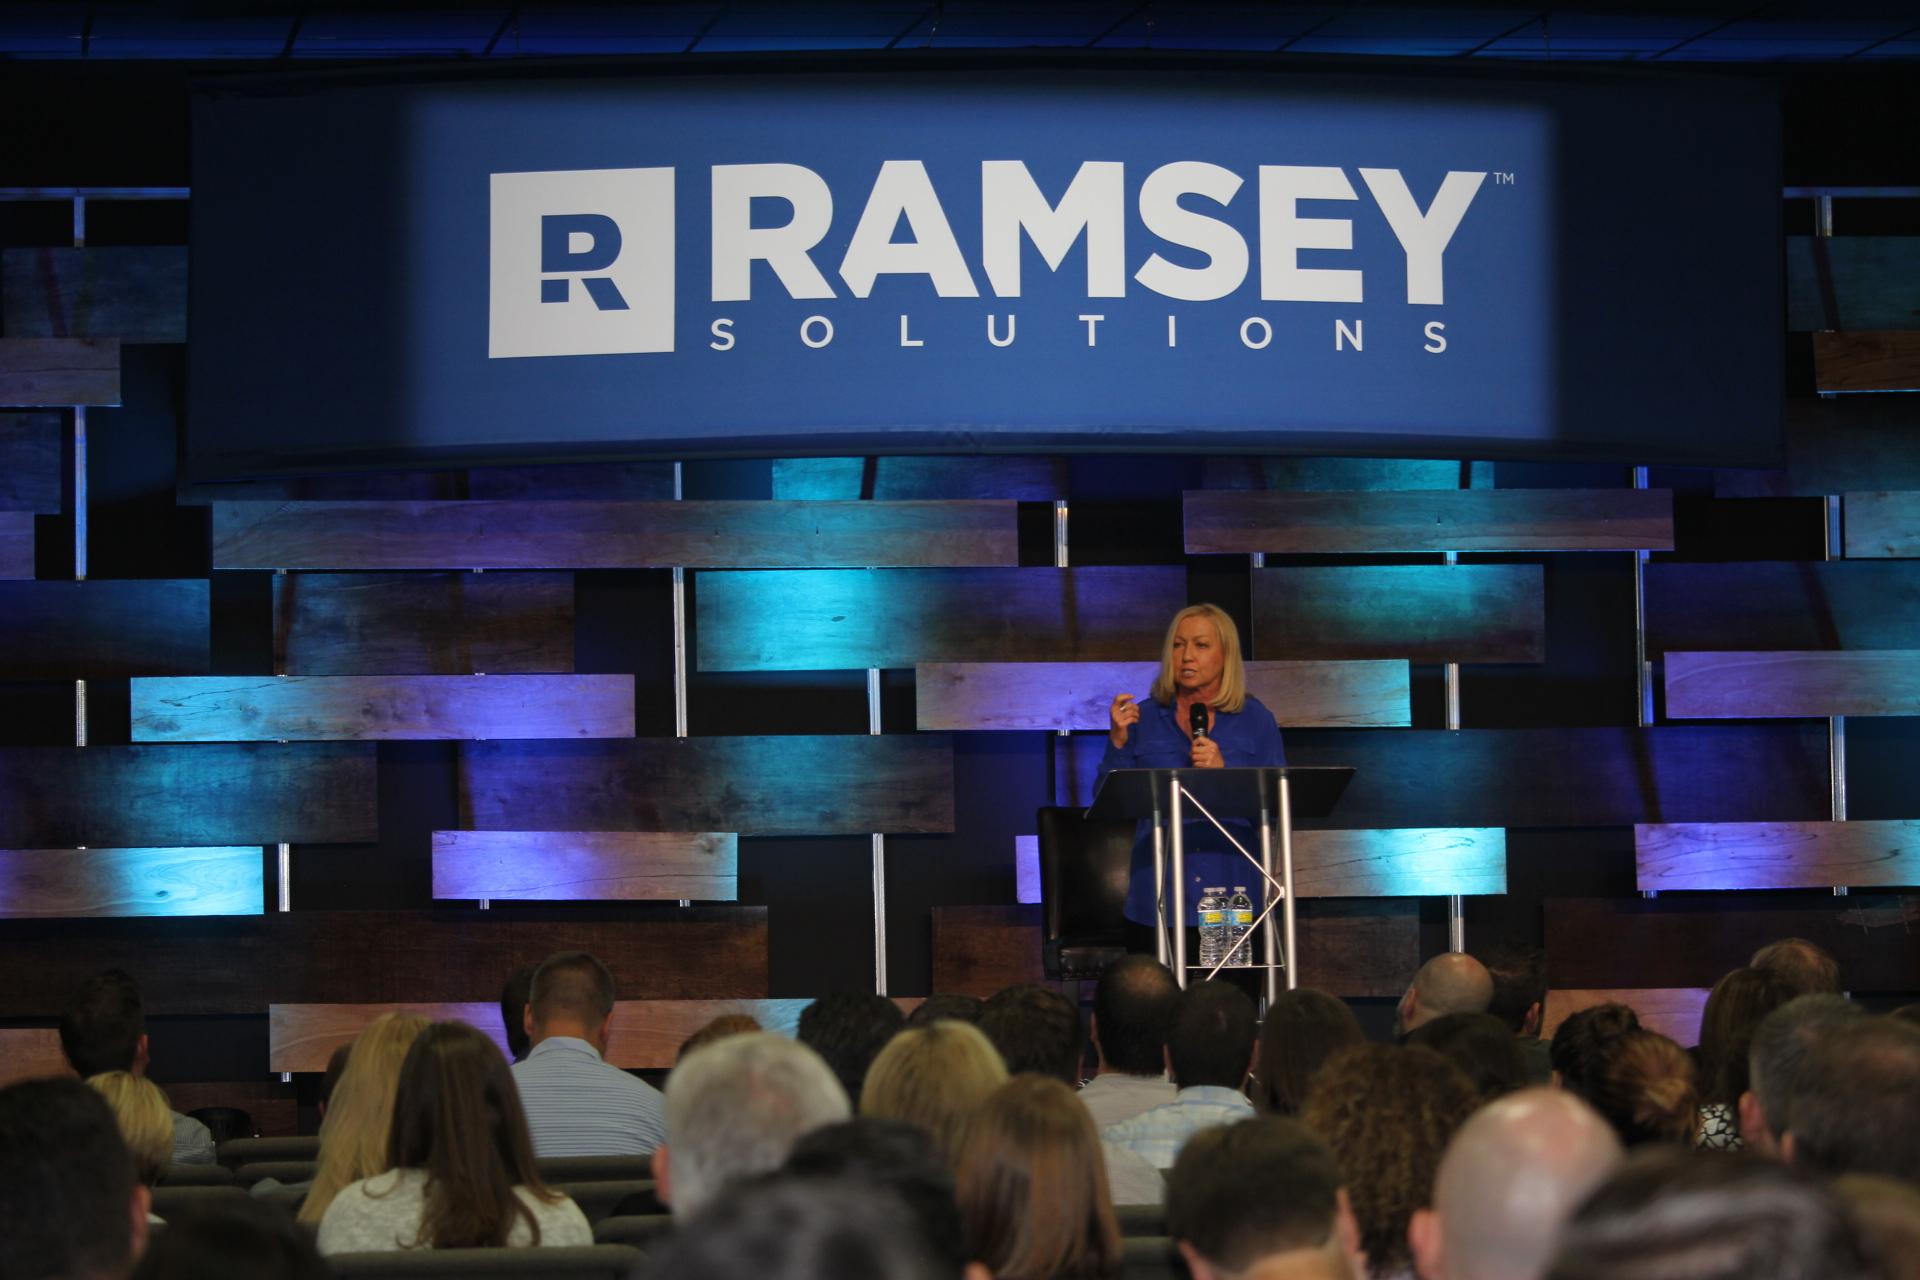 Nancy Alcorn addressing Ramsey Solutions staff